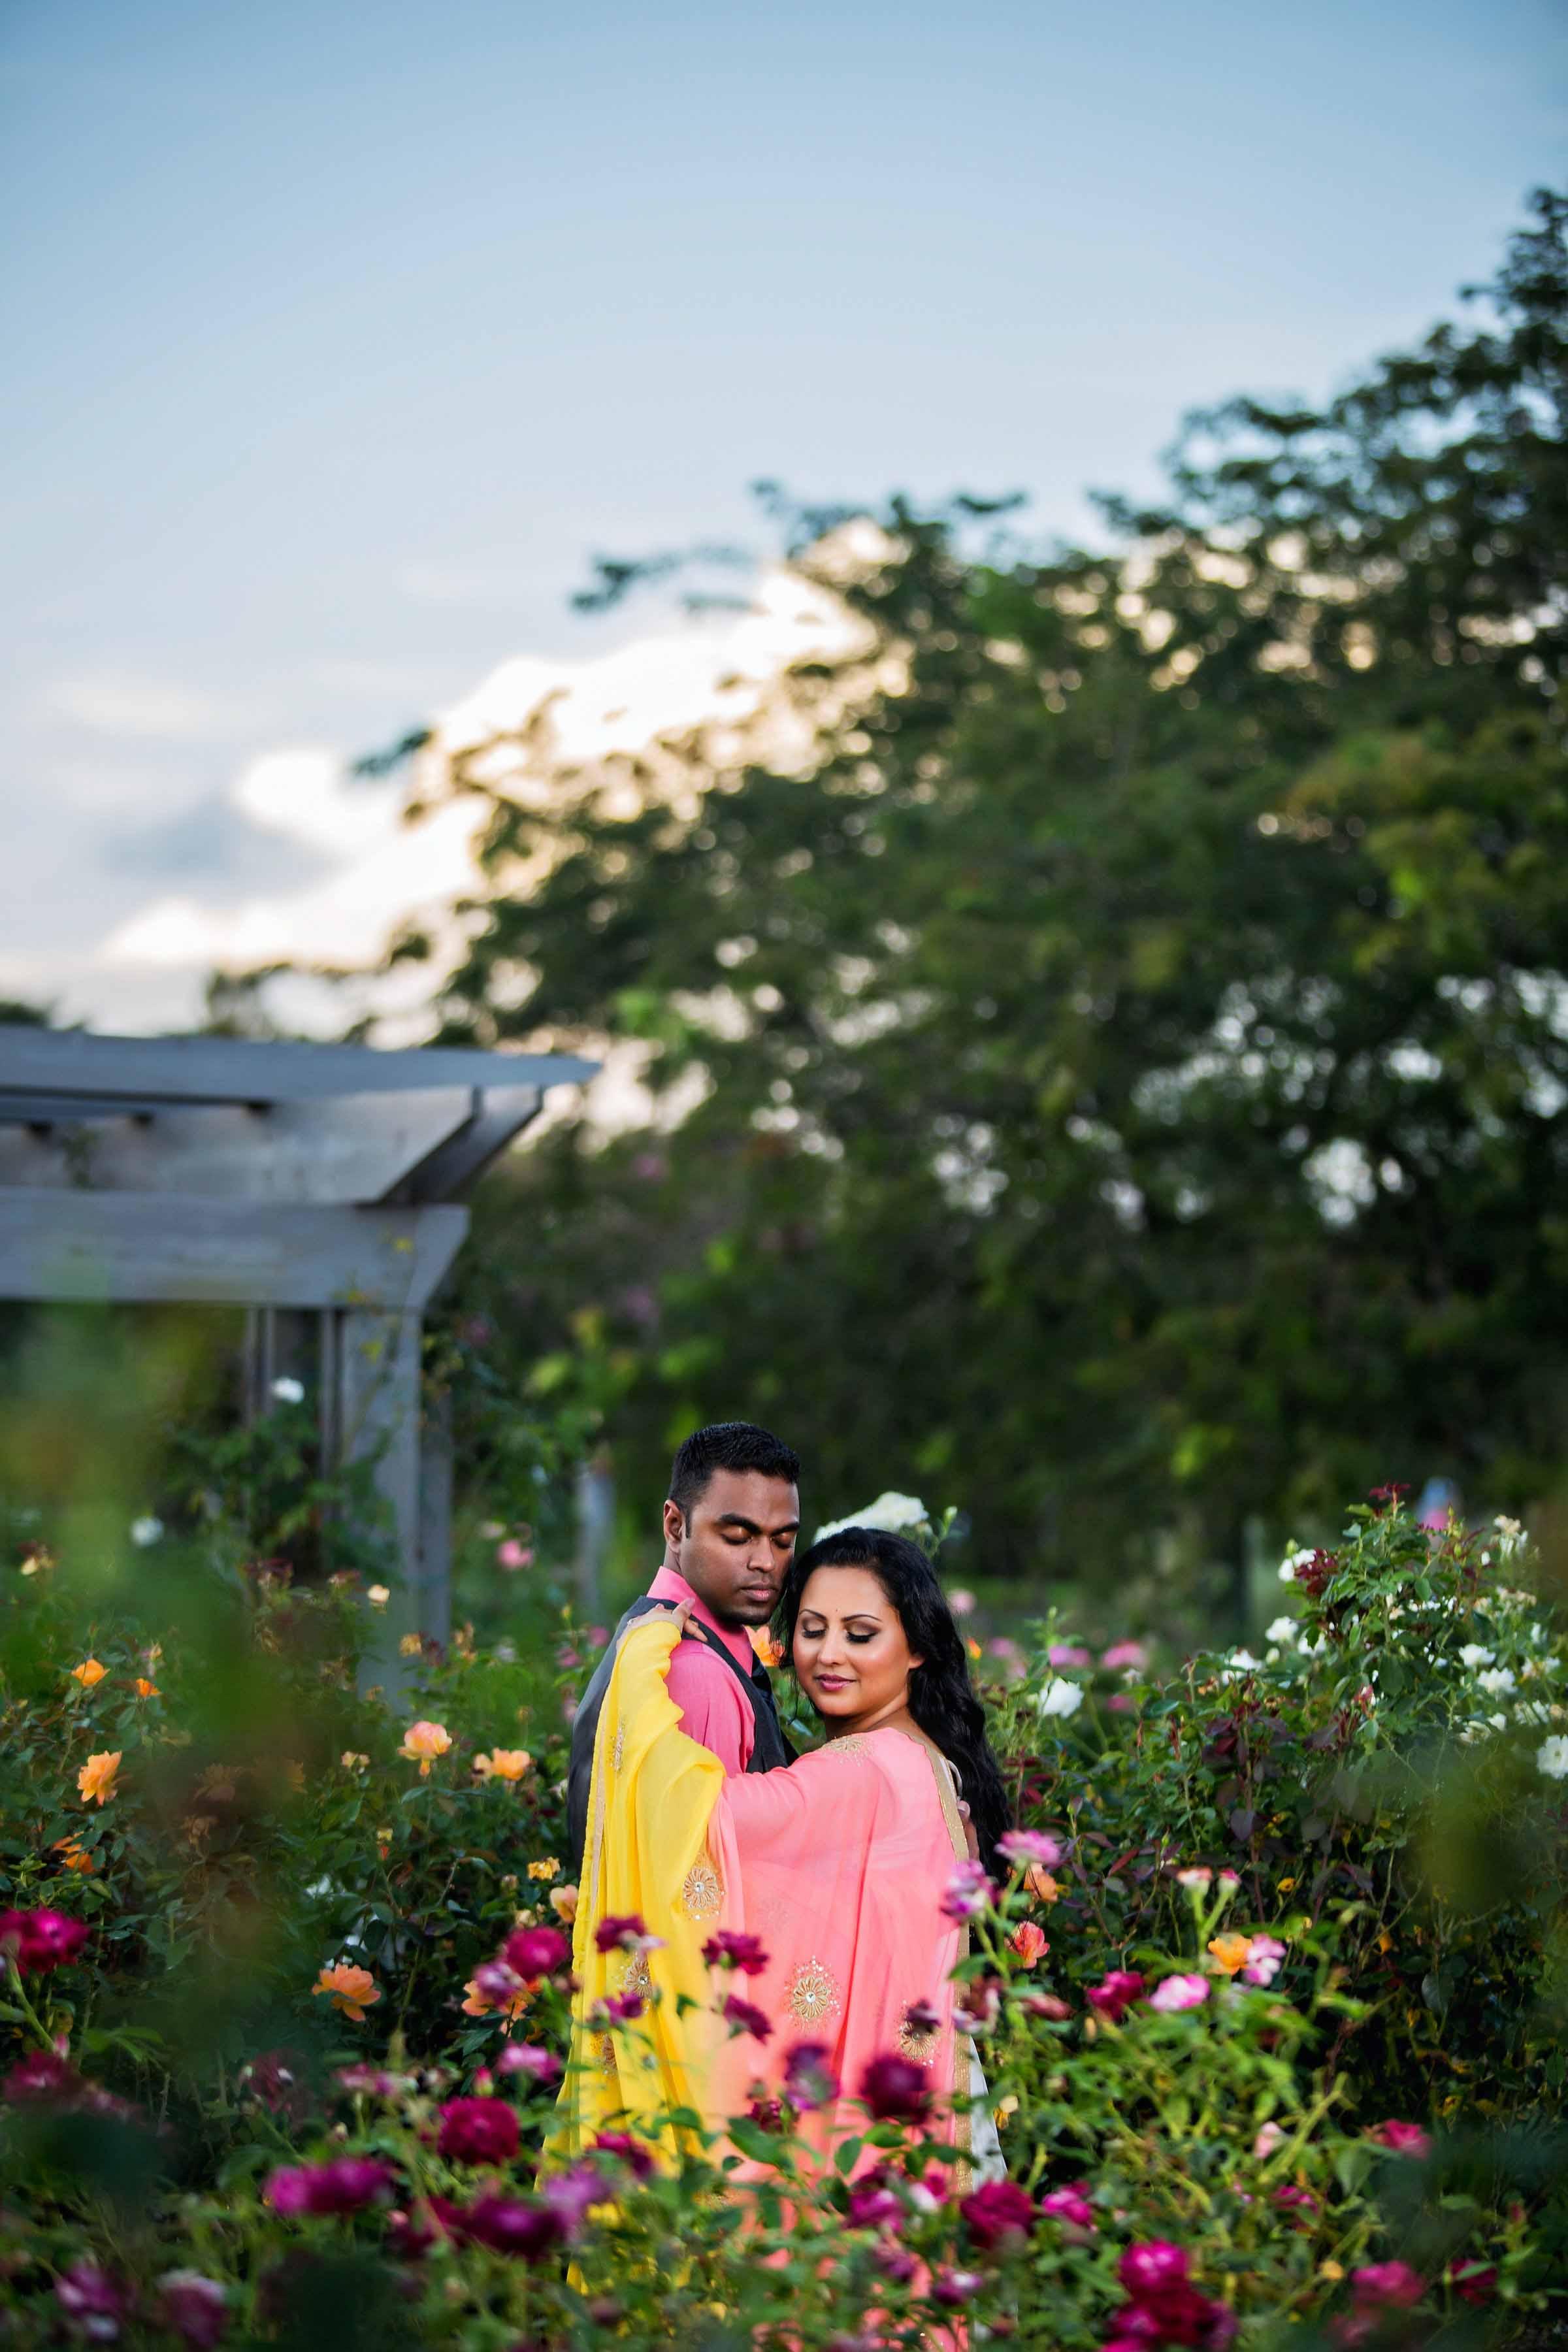 Norfolk Botanical Garden Engagement Portrait Photograph - Sharon And Merwyn -by John Cachero for Ross Costanza Photography